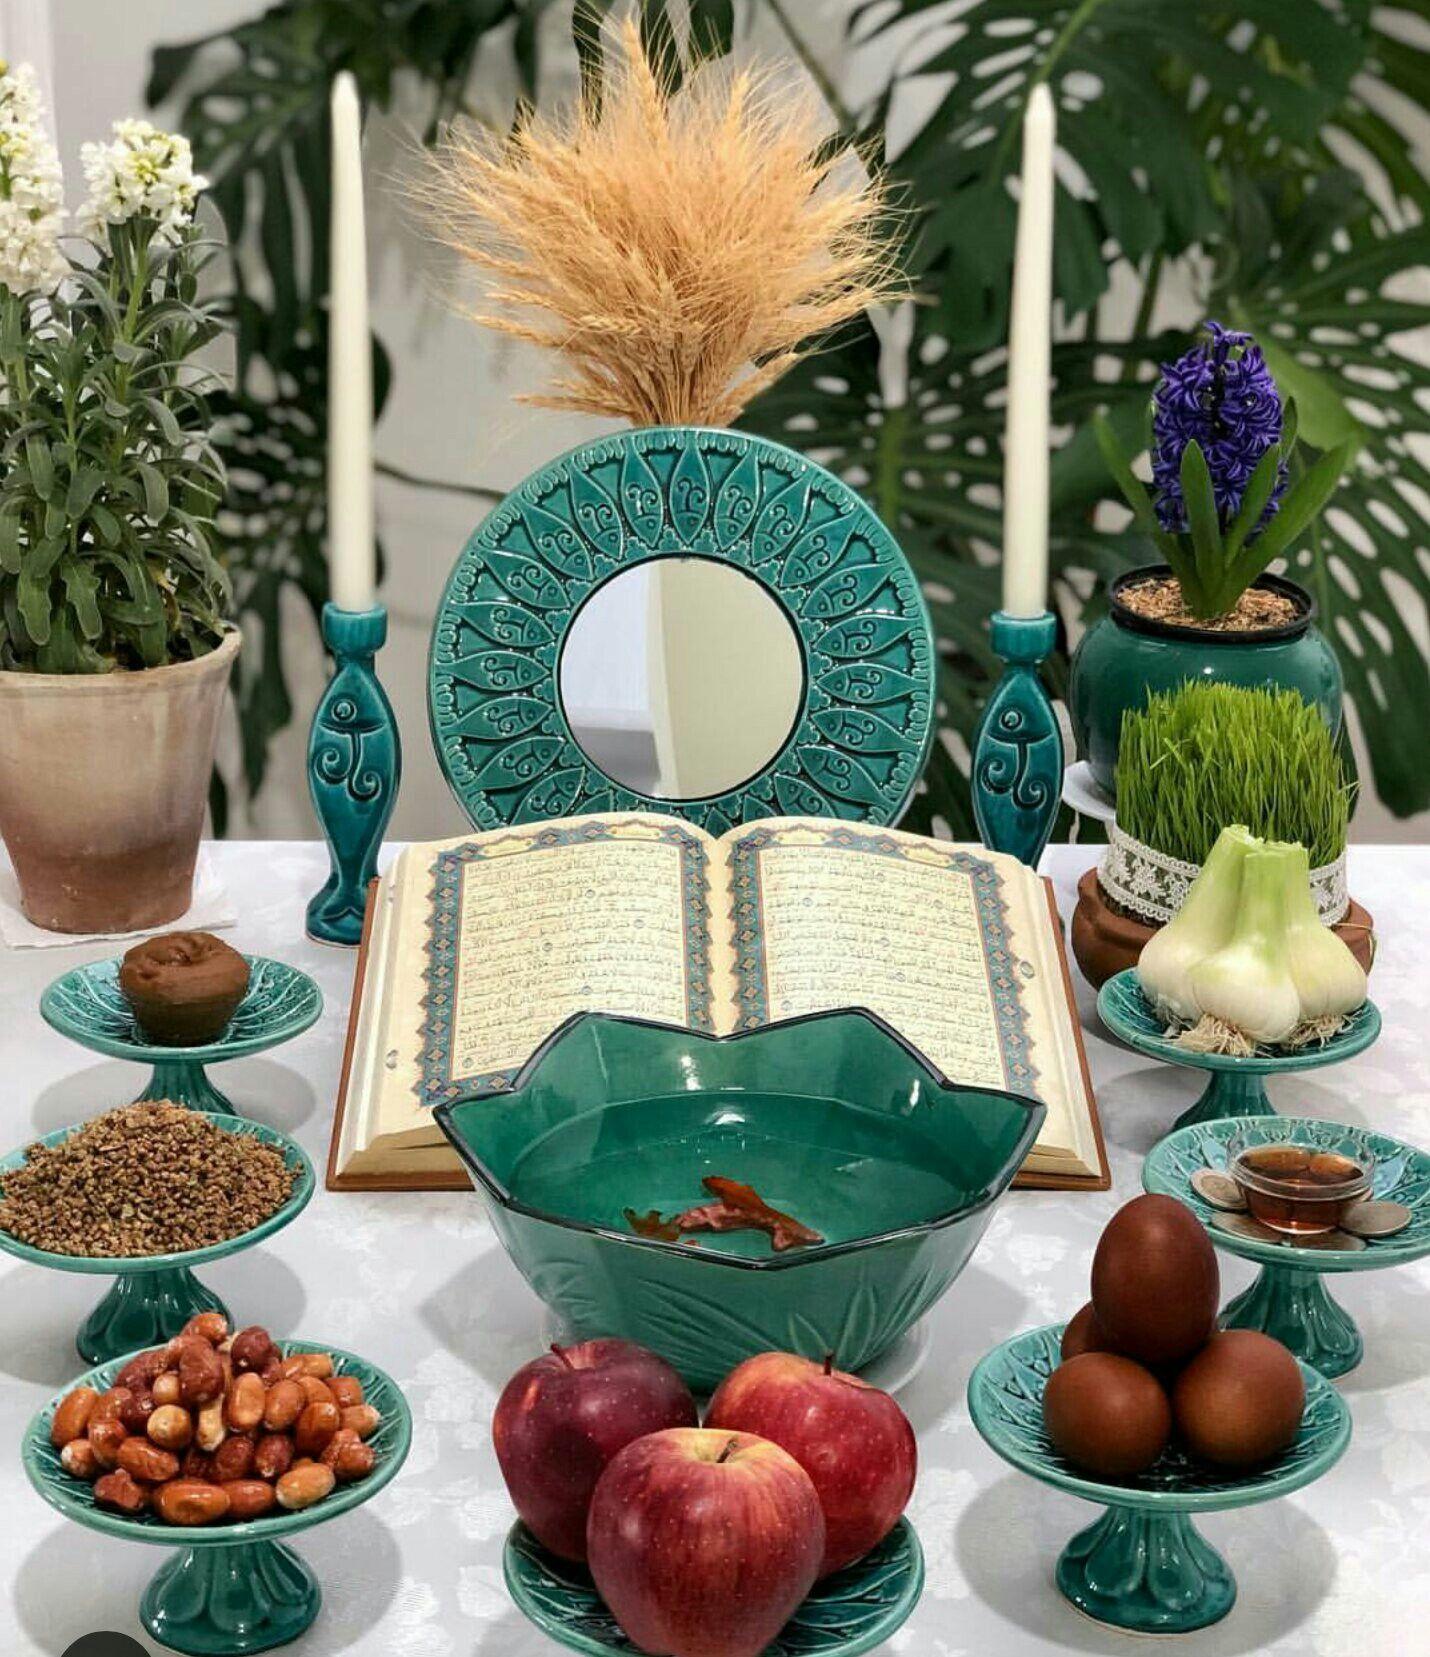 Happy new year to every one celebrating norouz around the